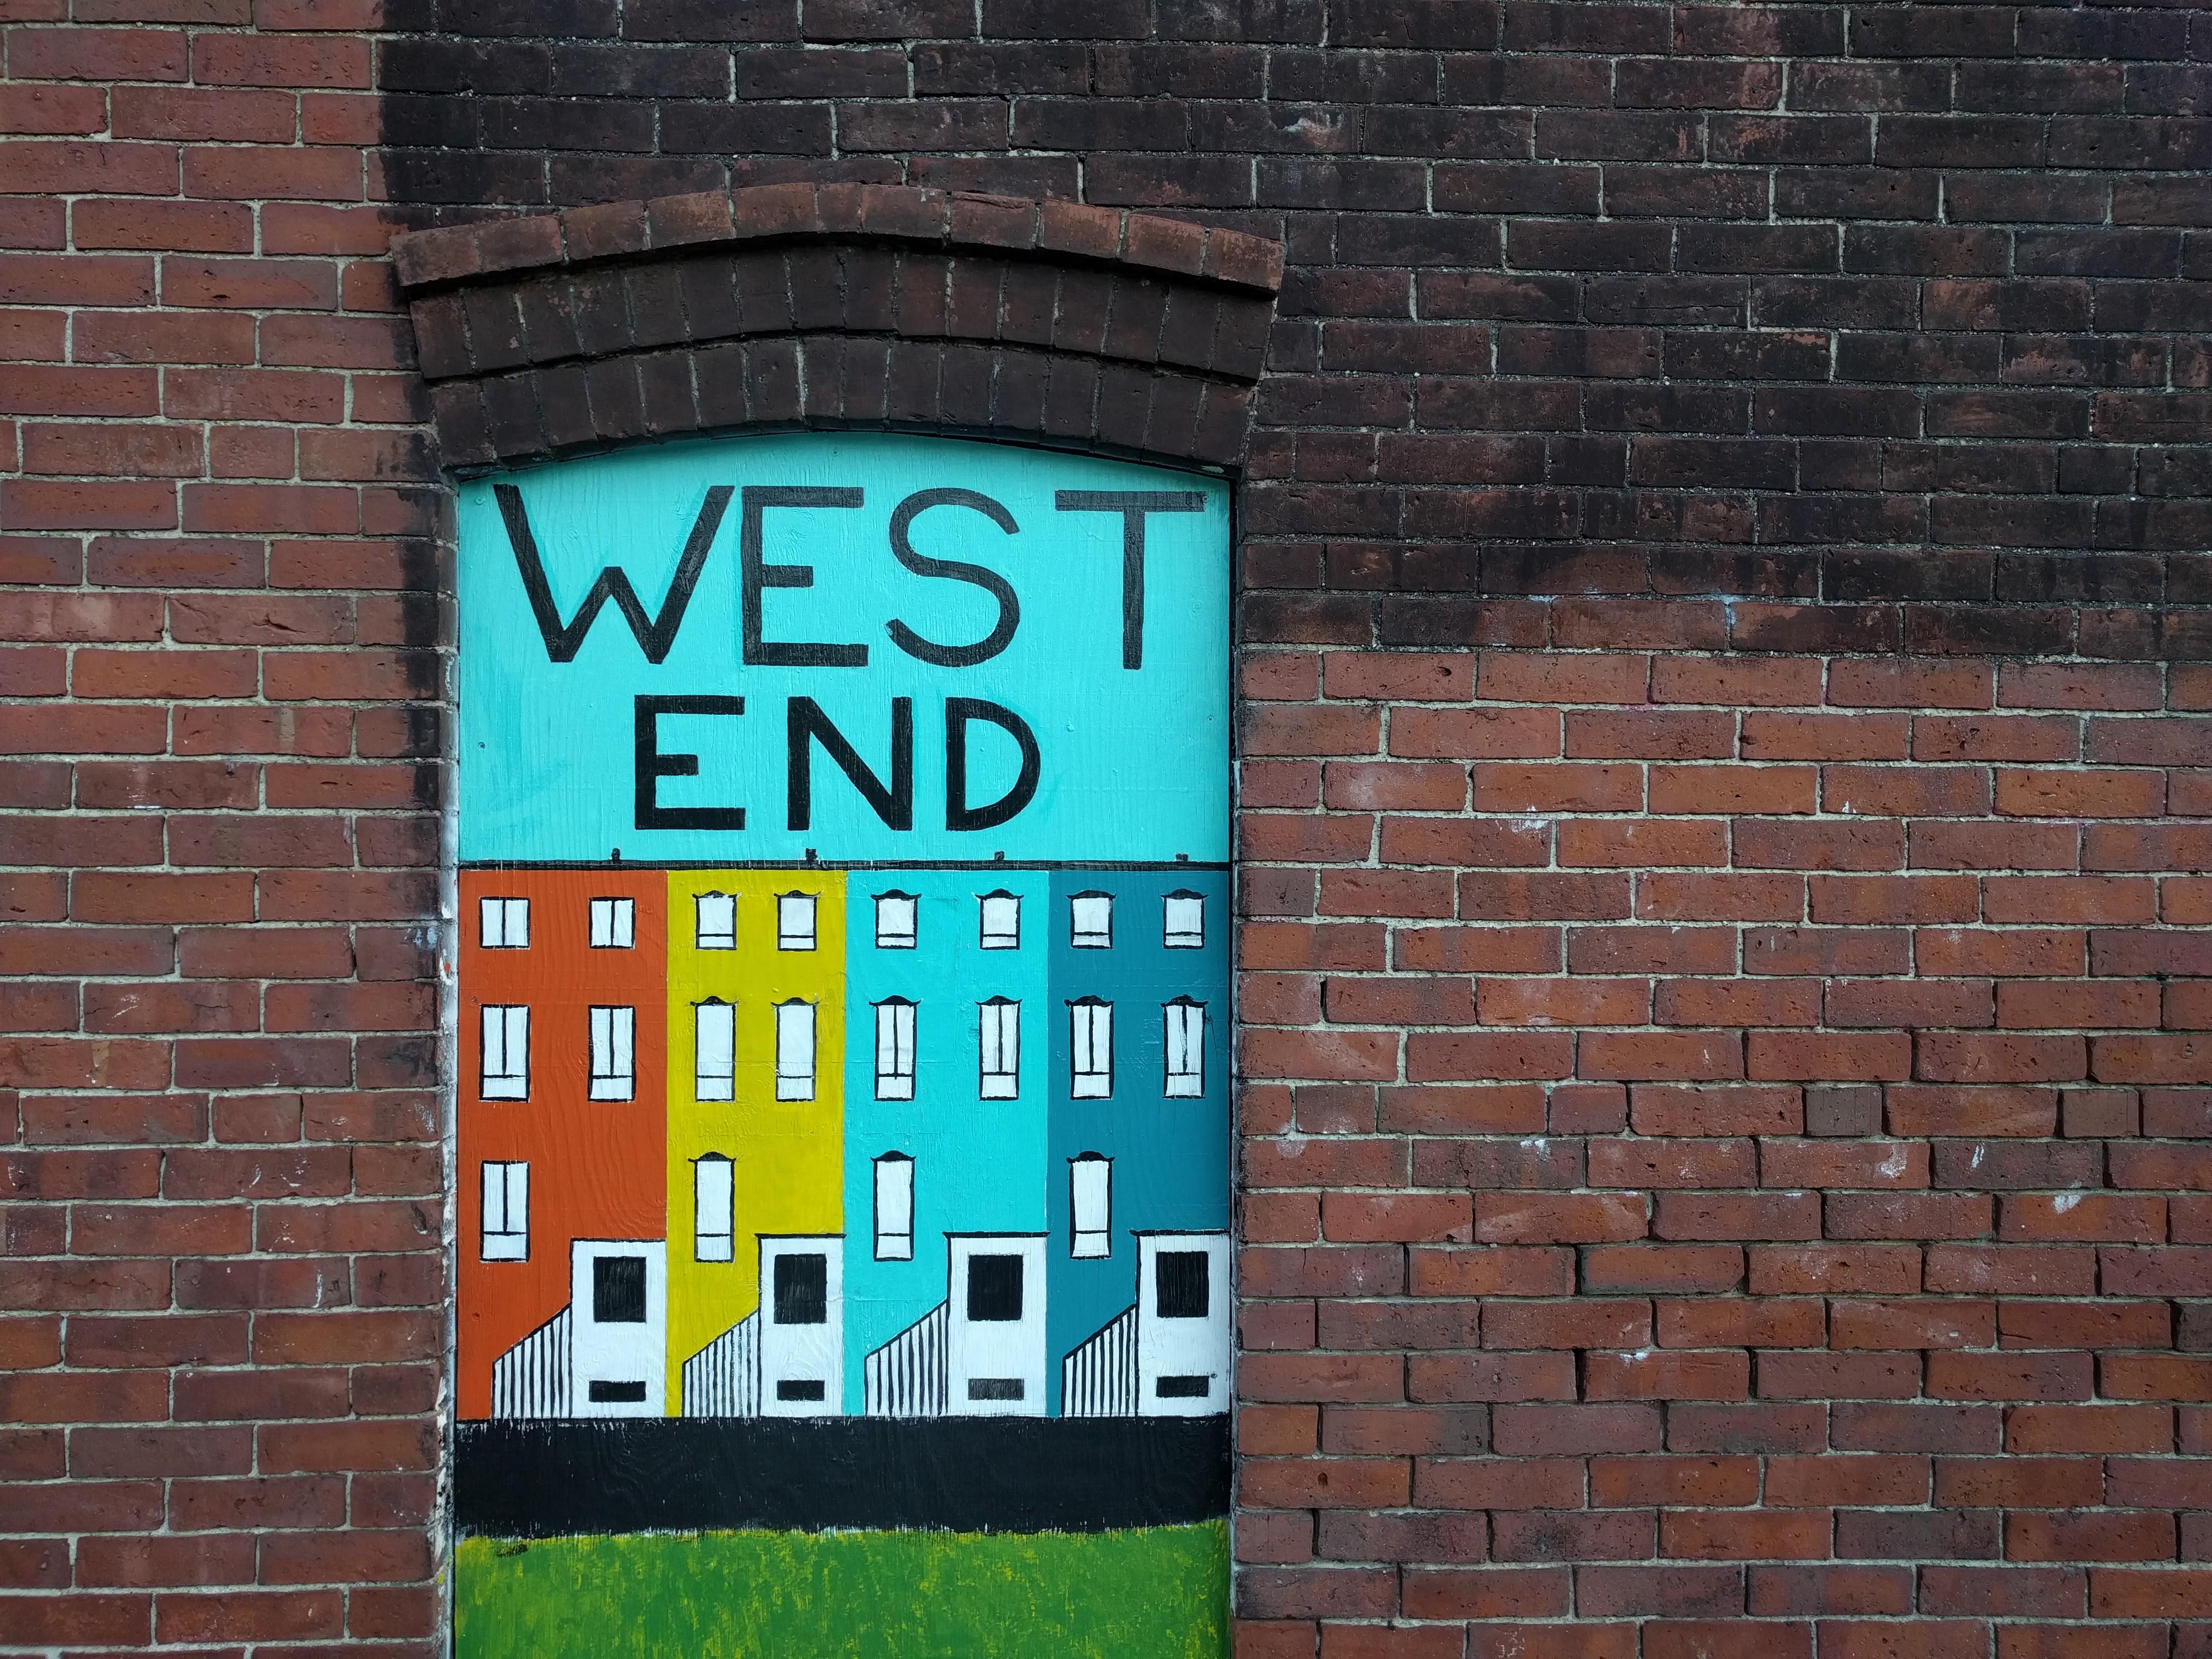 East End Murals